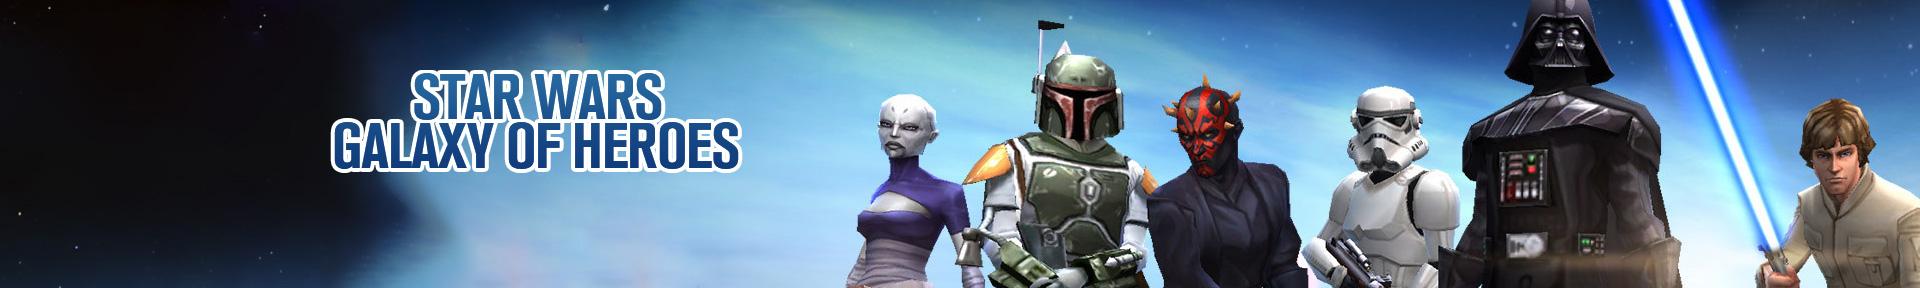 Star Wars Galaxy Of Heroes Crystals